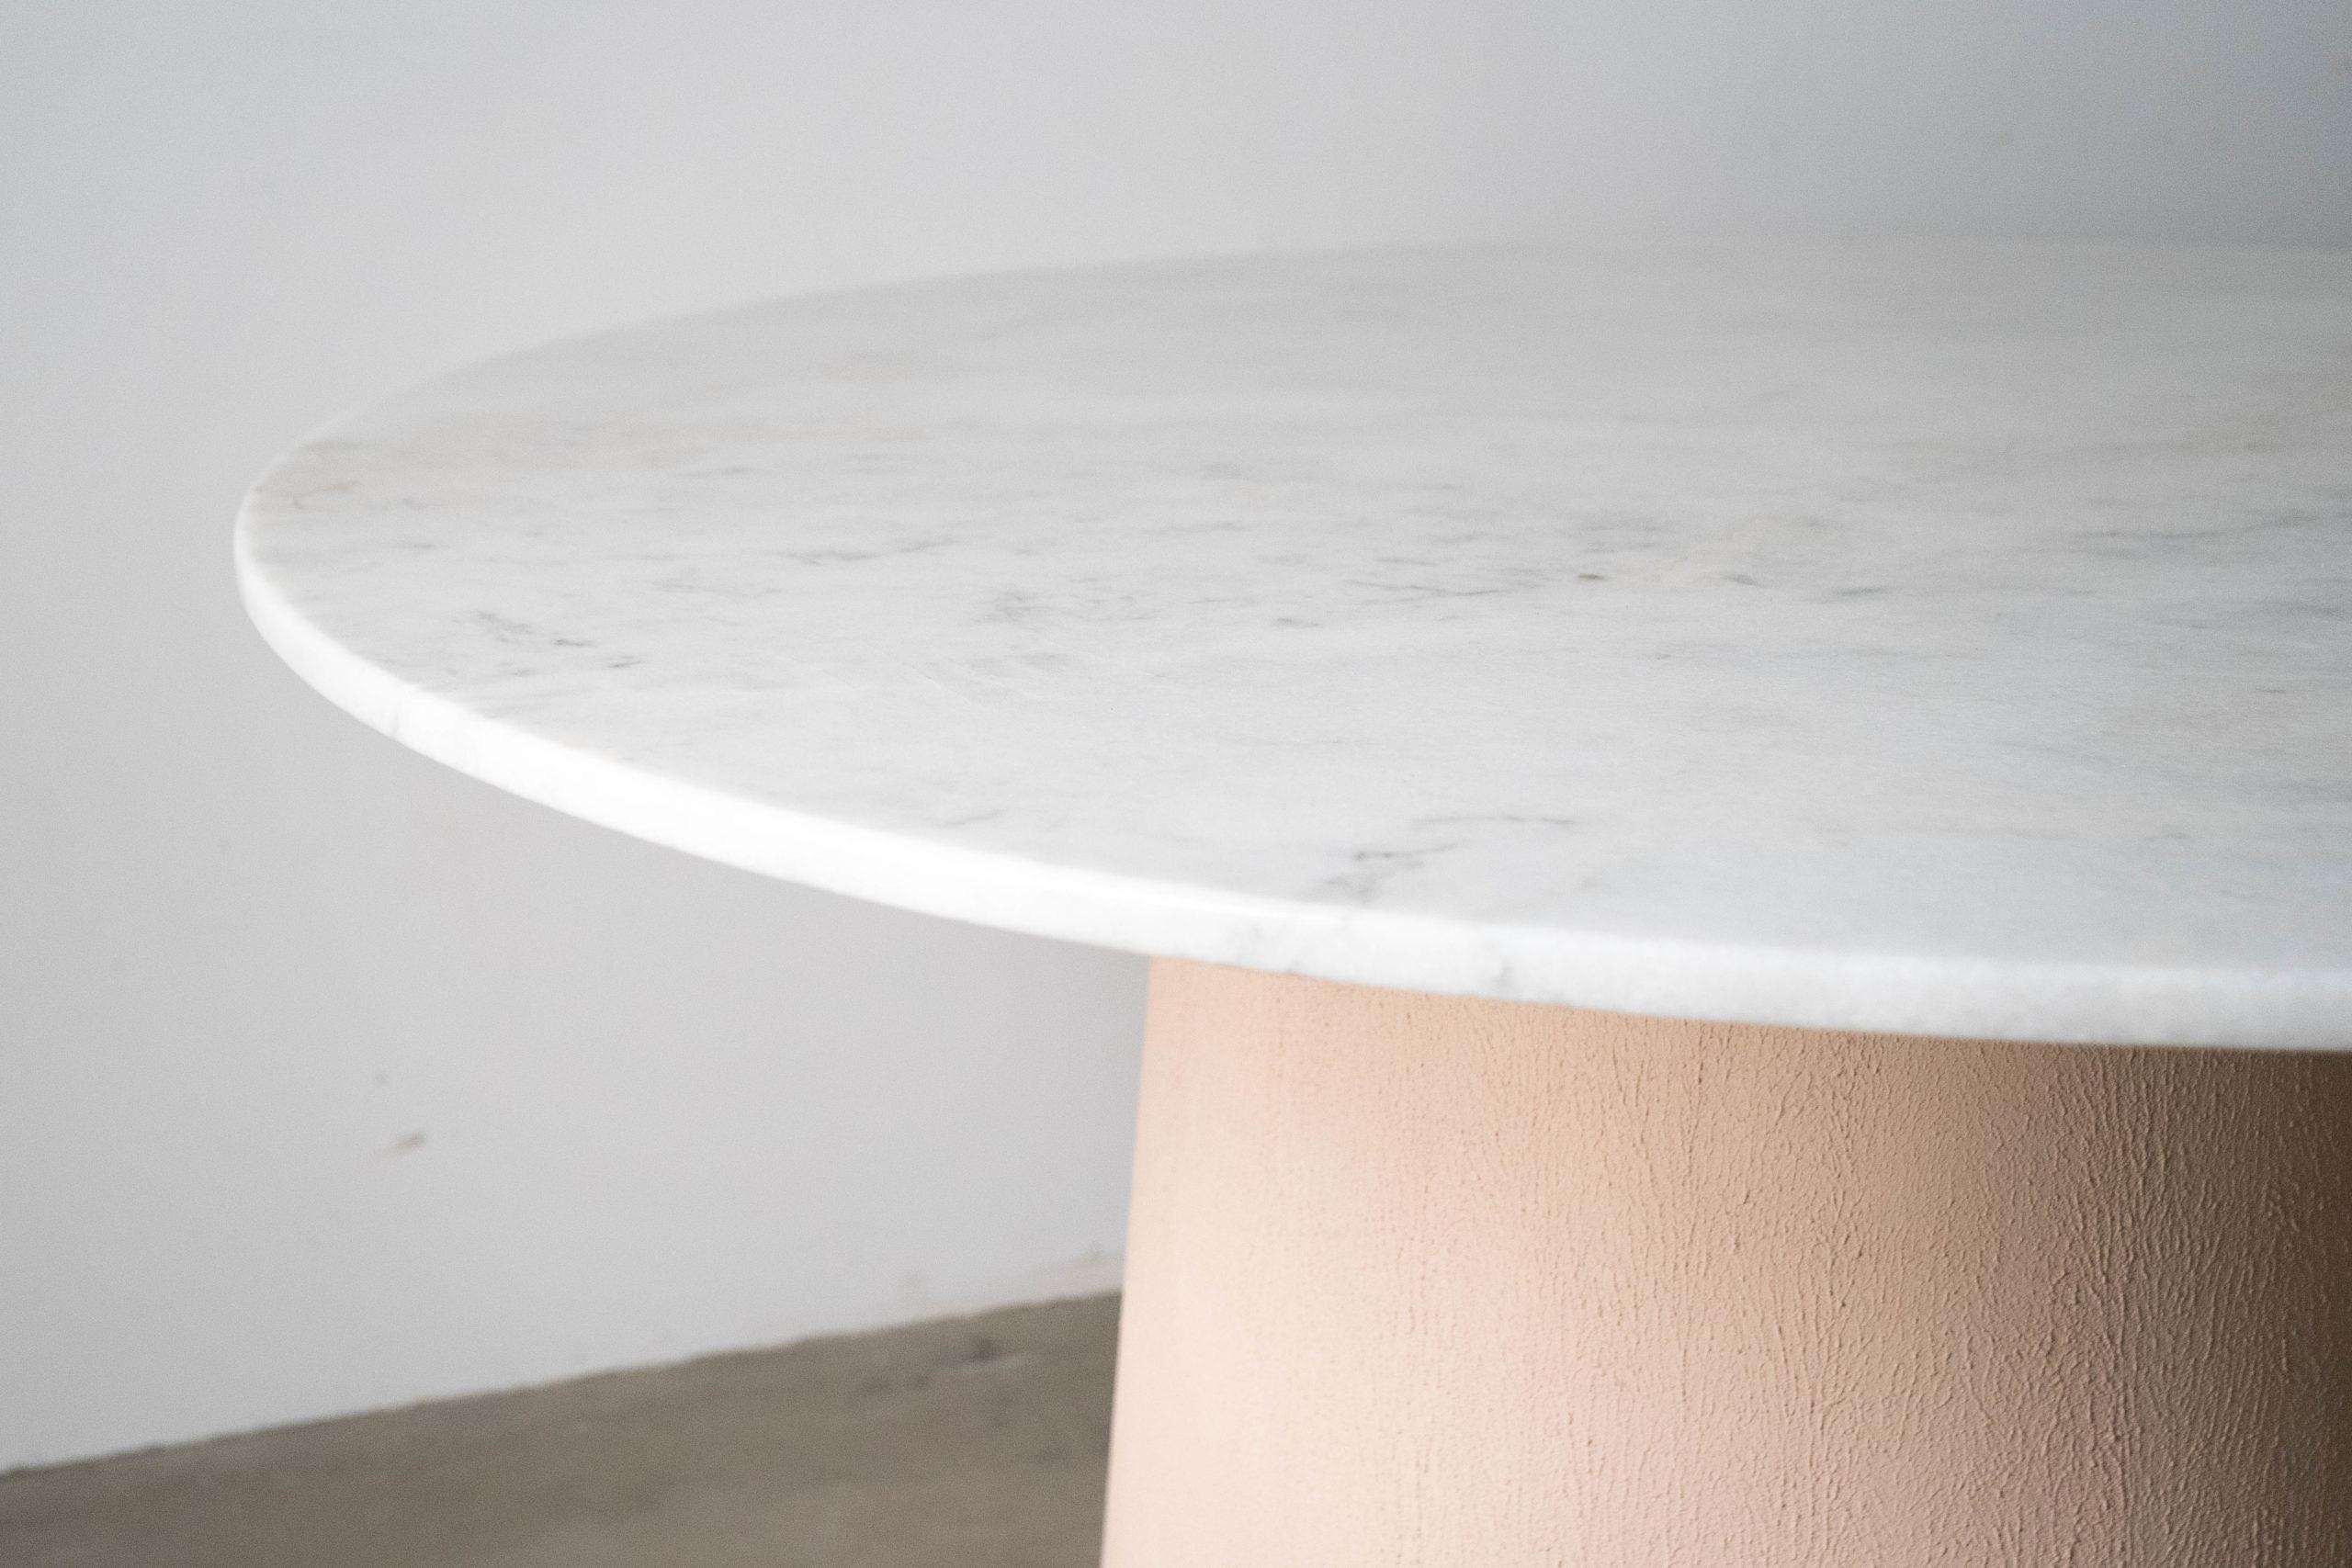 mesa pepita de oliva de mármol de diseño fabricada a mano